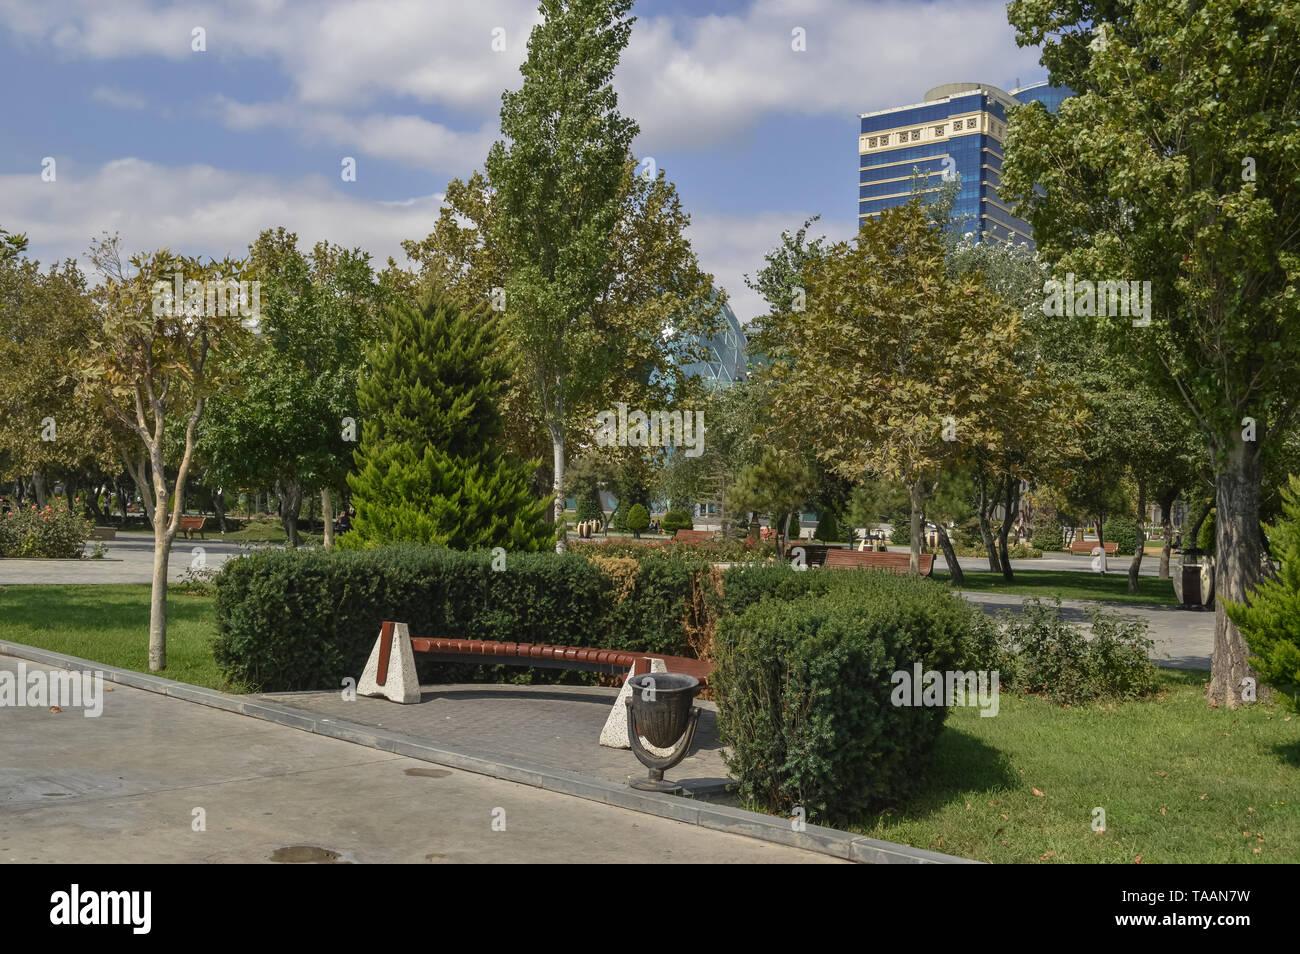 bench and trash can placed inside bushes at Baku Bulvar - Stock Image